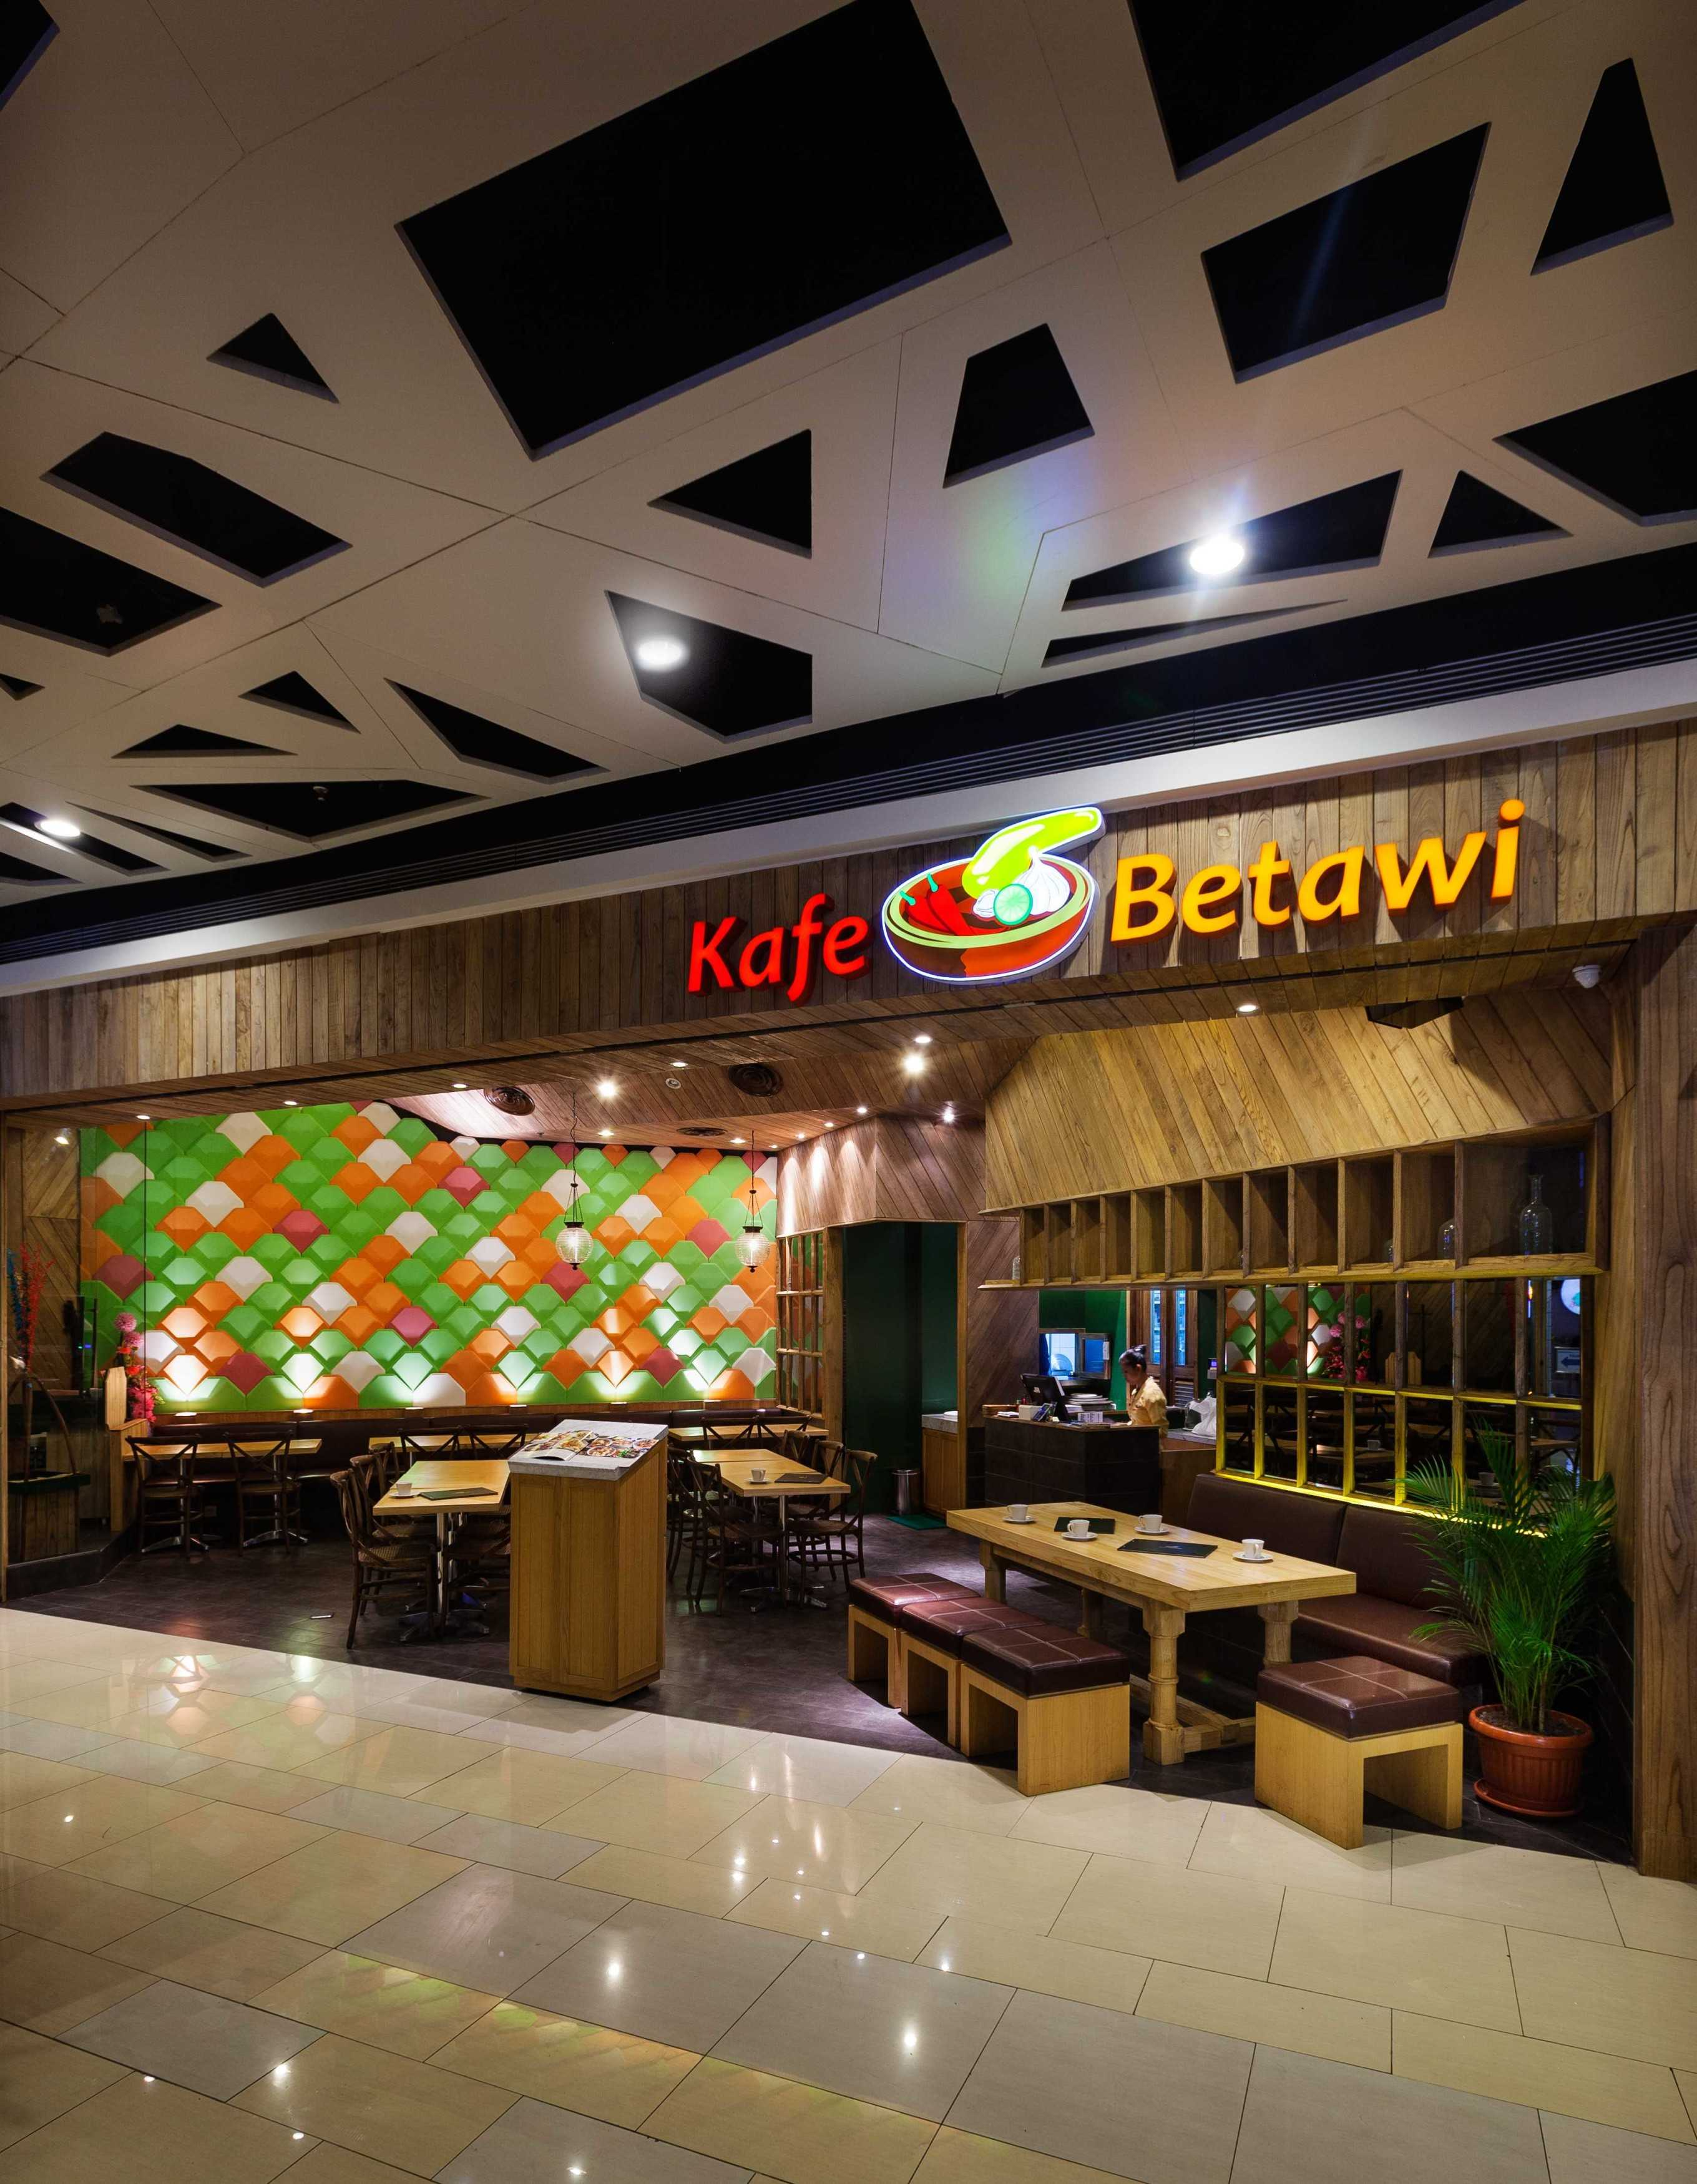 Highstreet Kafe Betawi Kota Kasablanka, Jakarta Kota Kasablanka, Jakarta Img8947 Tradisional  28740